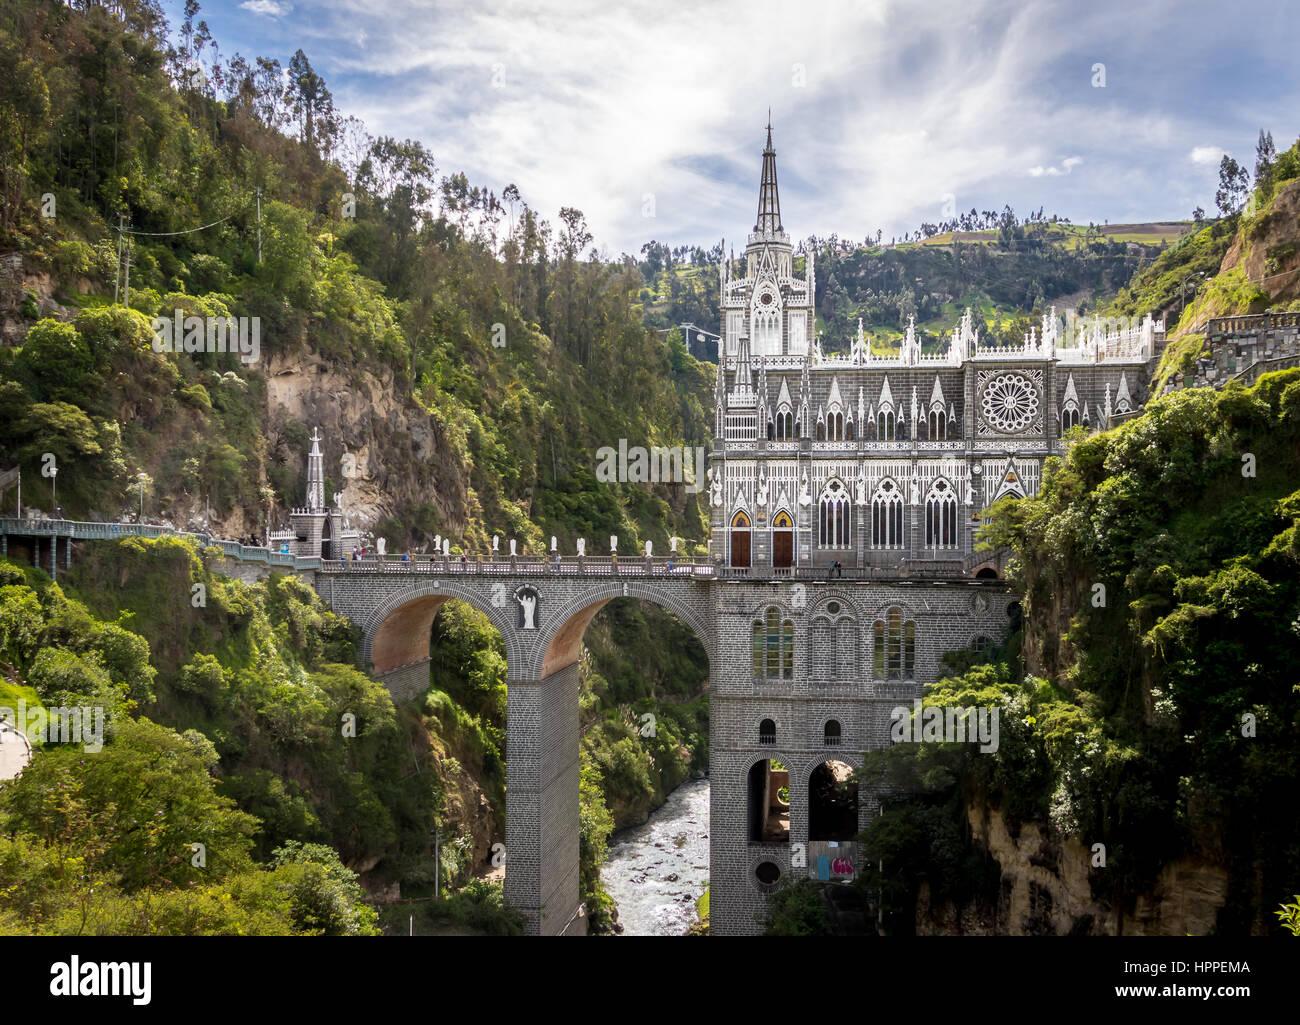 Las Lajas Sanctuary - Ipiales, Colombia - Stock Image